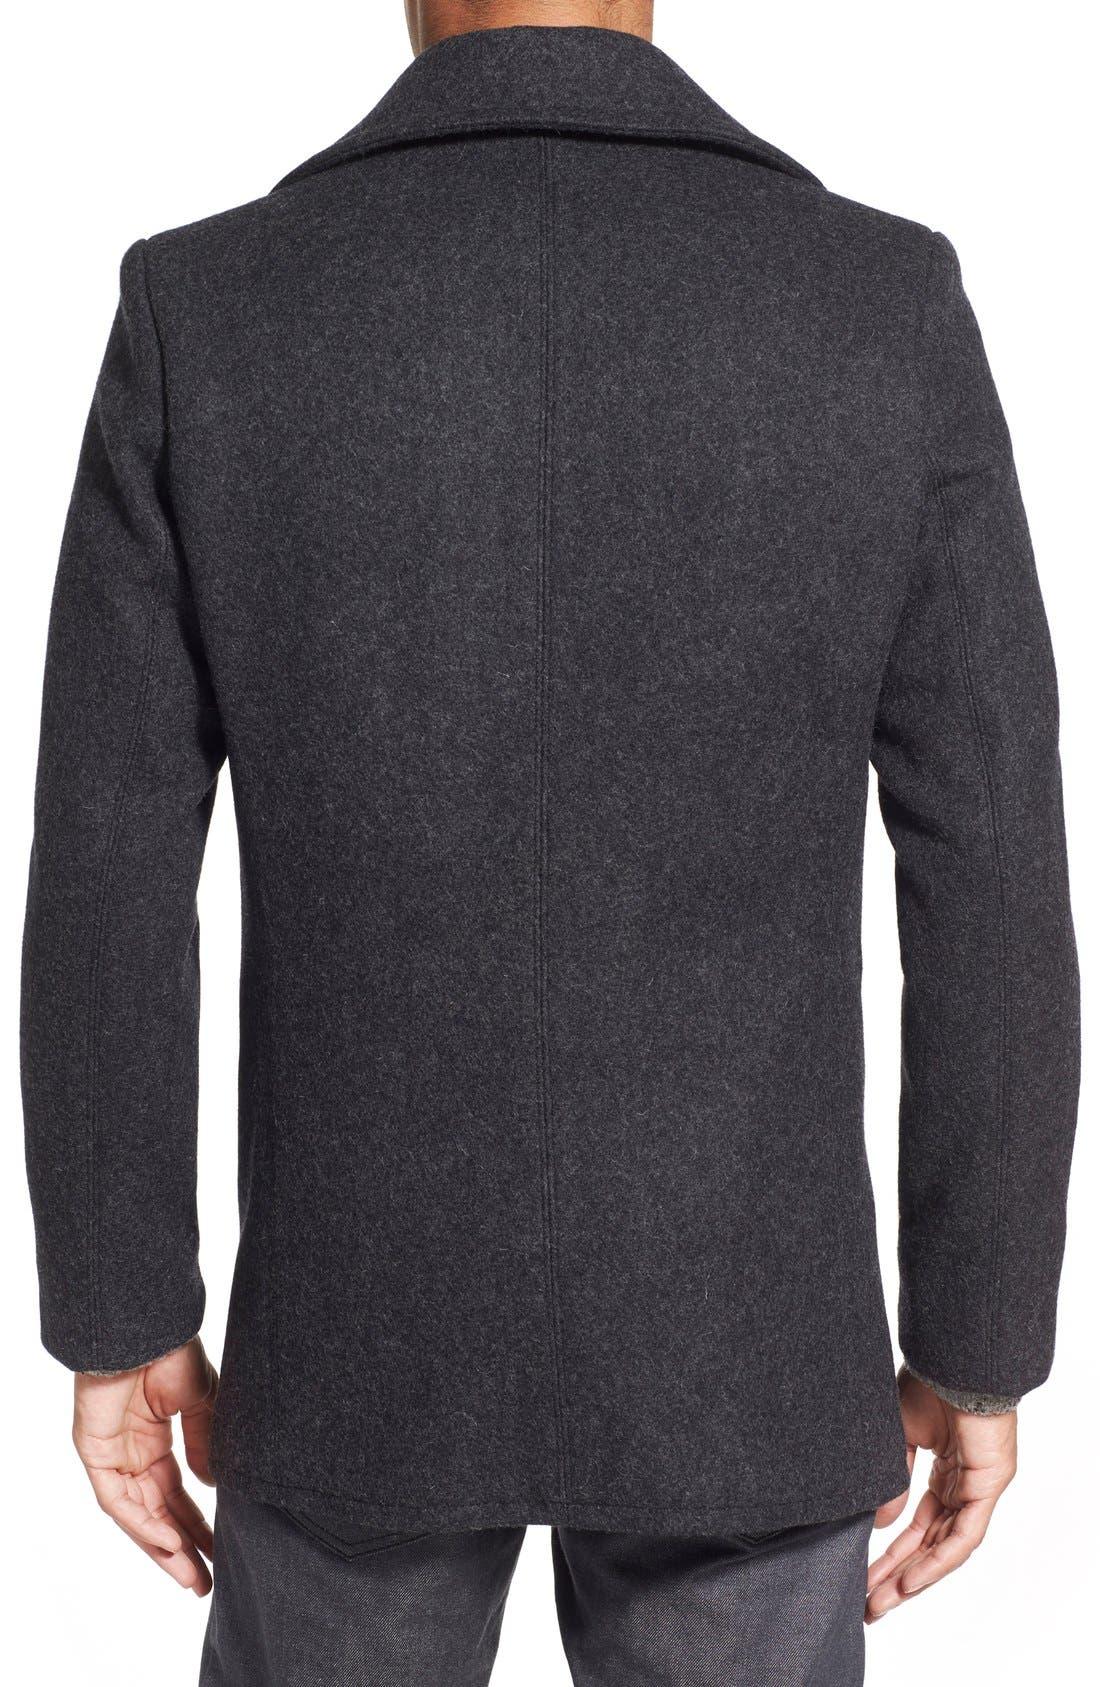 Slim Fit Wool Blend Peacoat,                             Alternate thumbnail 2, color,                             Dark Oxford Grey